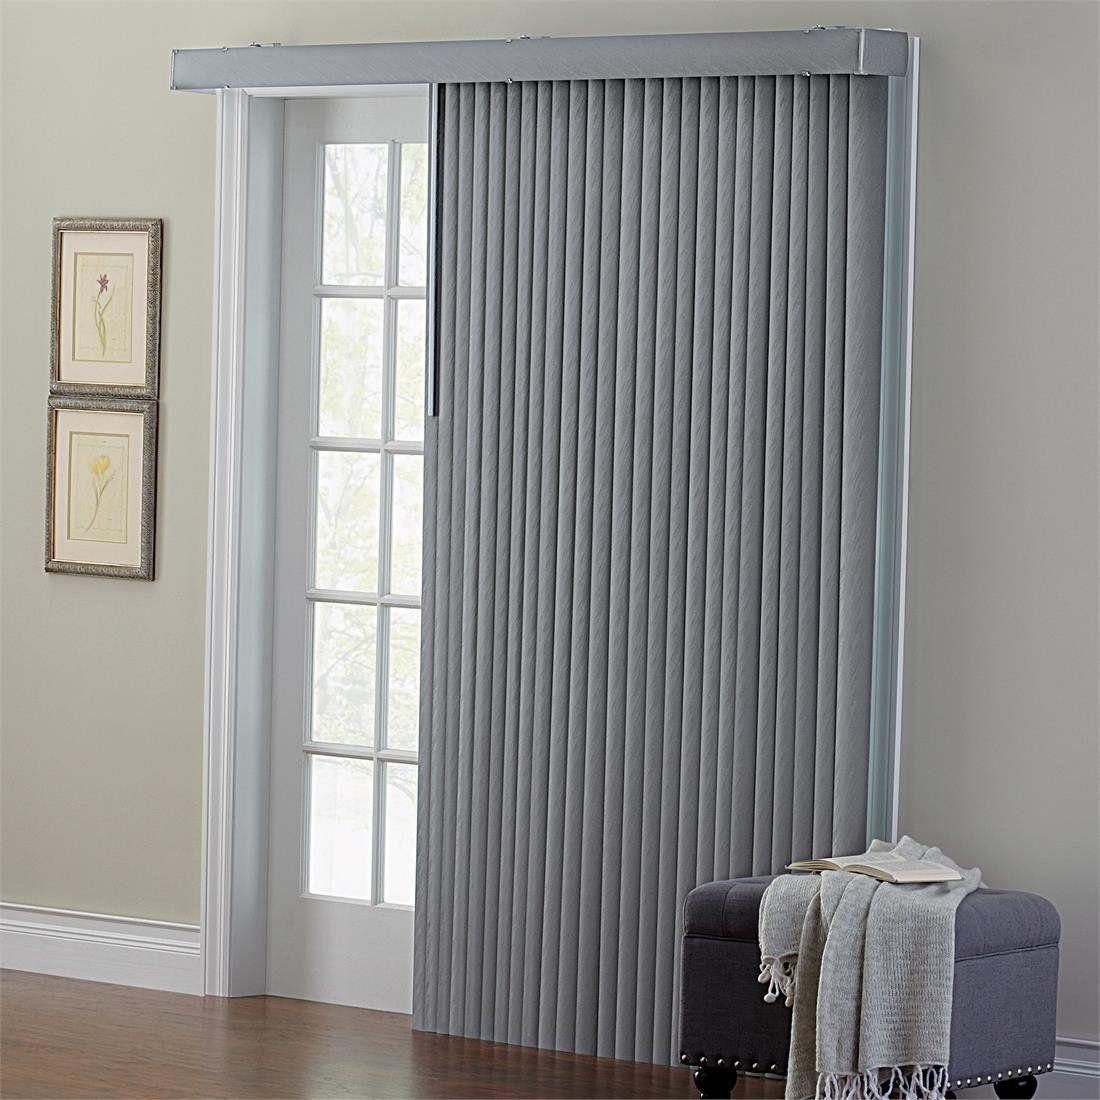 Blinds for sliding glass doors horizontal togethersandia